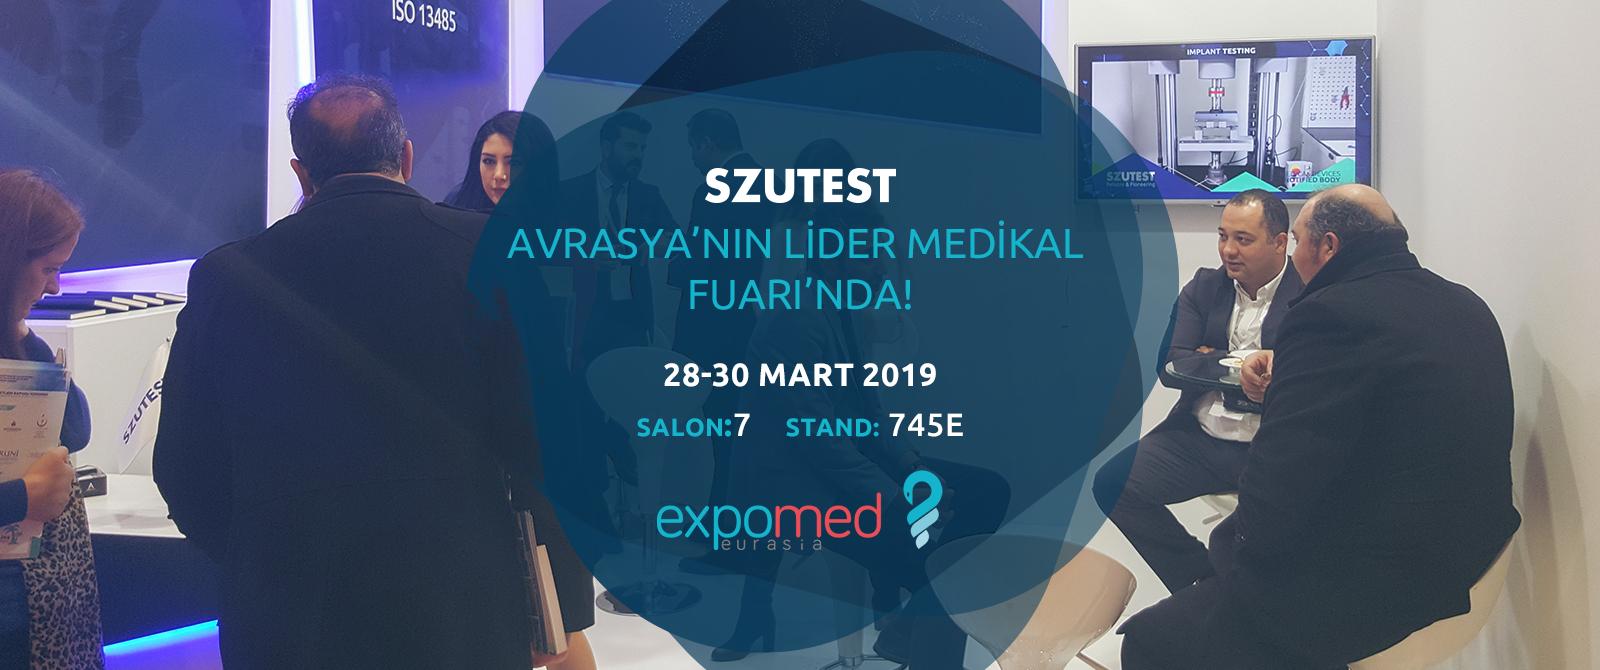 expomed-szutest-2018-web-banner-1